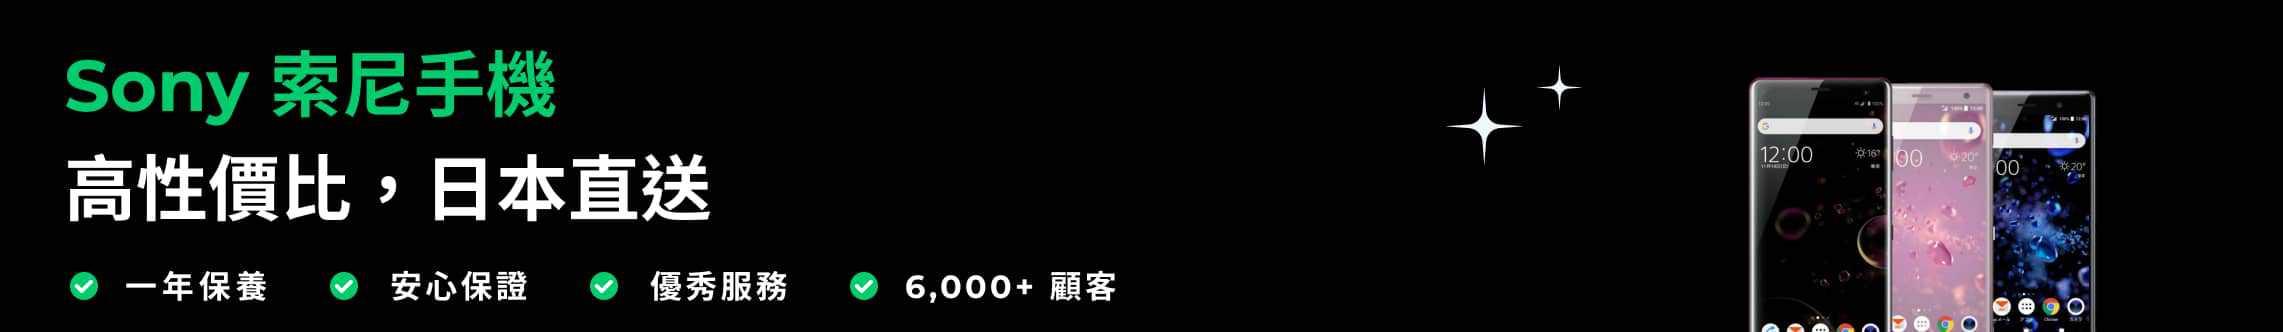 Sony手機 索尼手機 日本直送